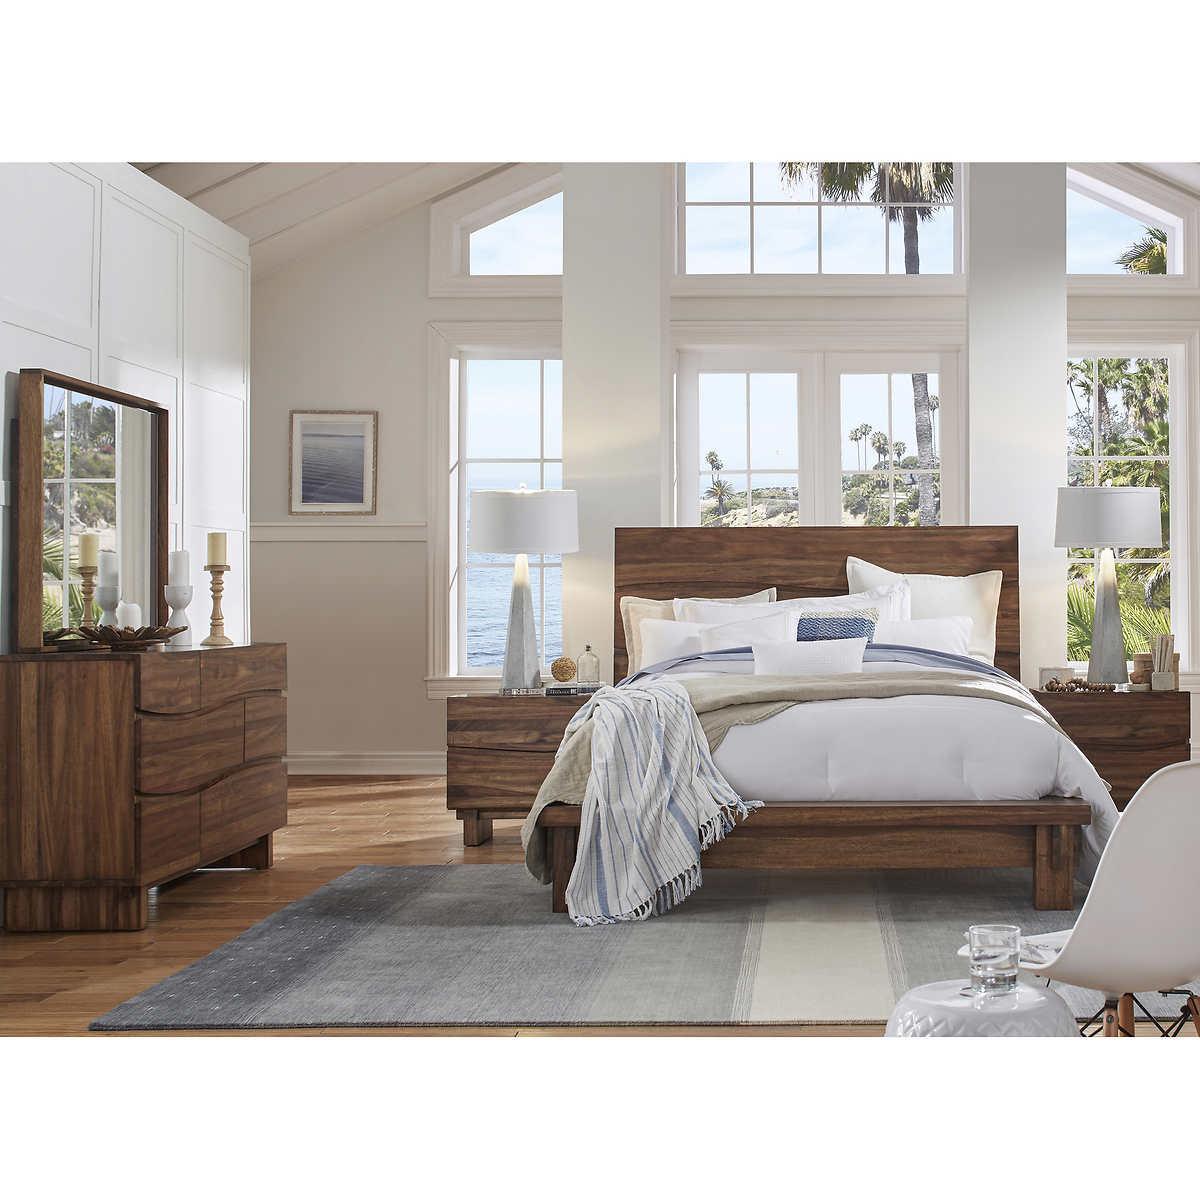 Bedroom Set With Desk Best Home Decorating Ideas